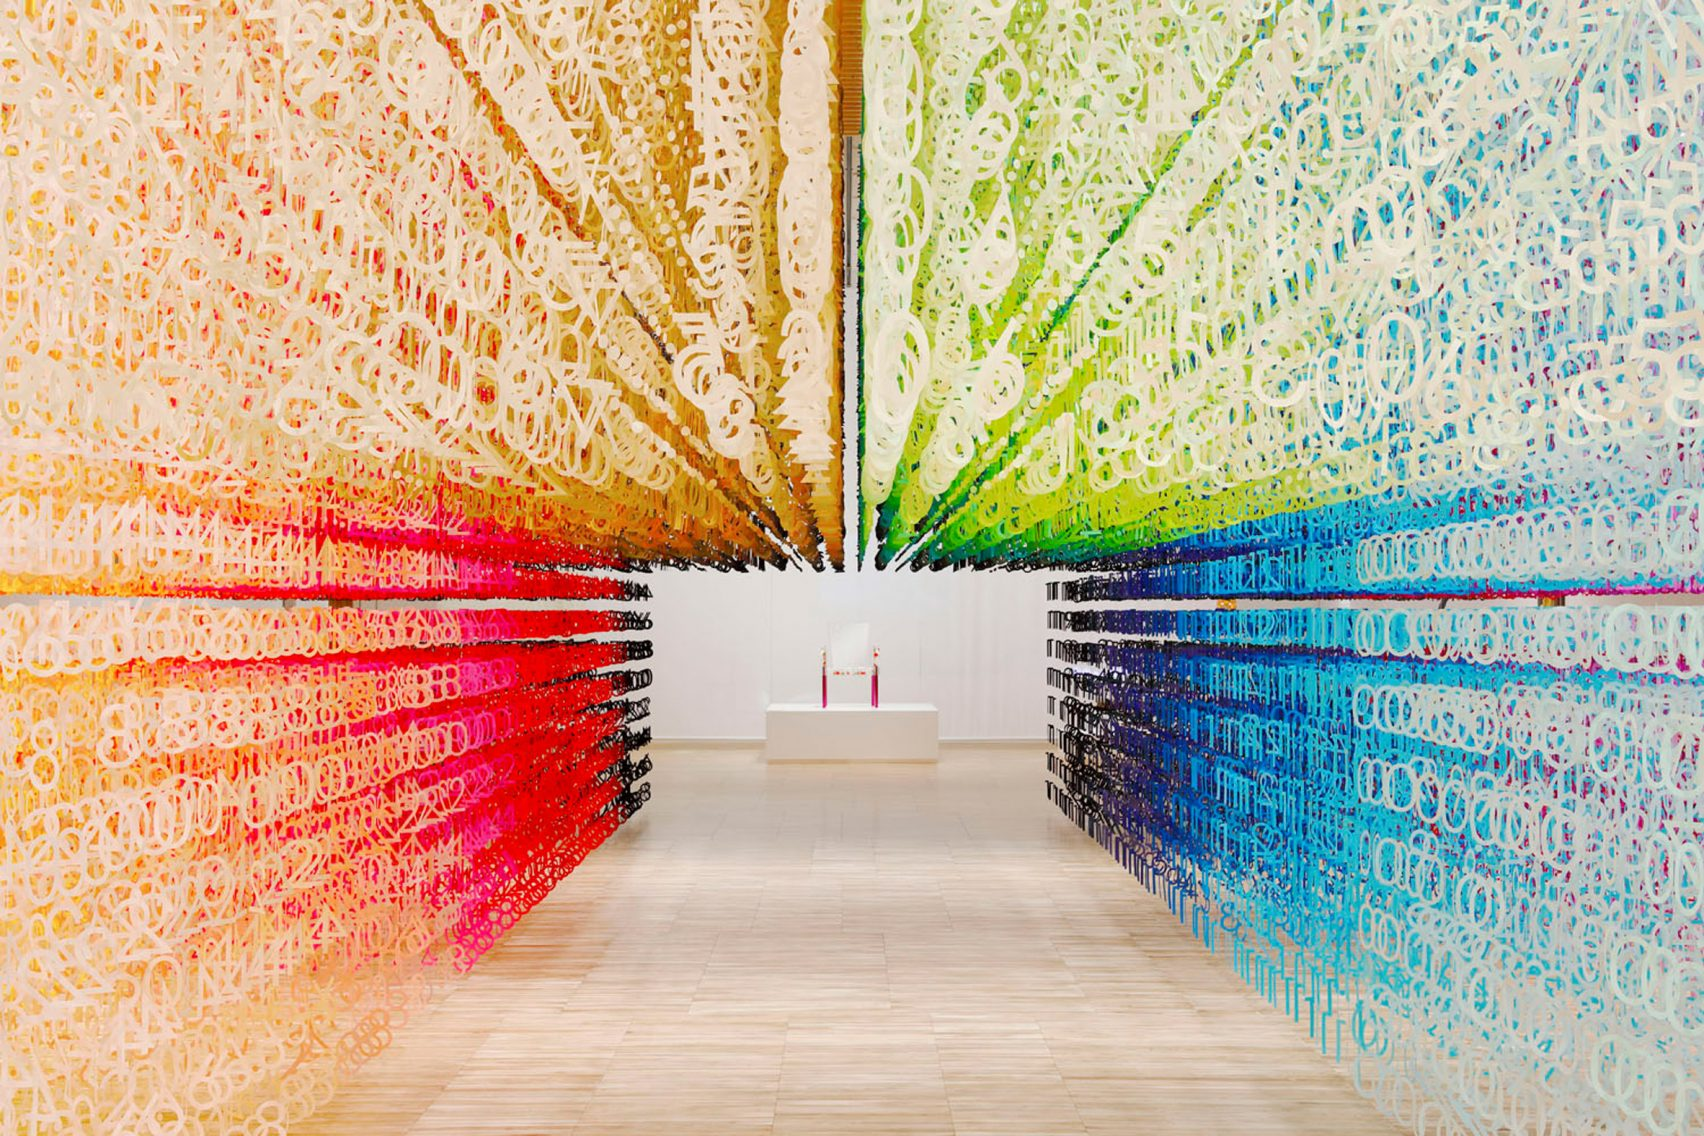 colour-of-time-emmanuelle-moureaux-installation-rainbow-toyama-museum-art-design-japan_dezeen_2364_col_1-1704x1136.jpg